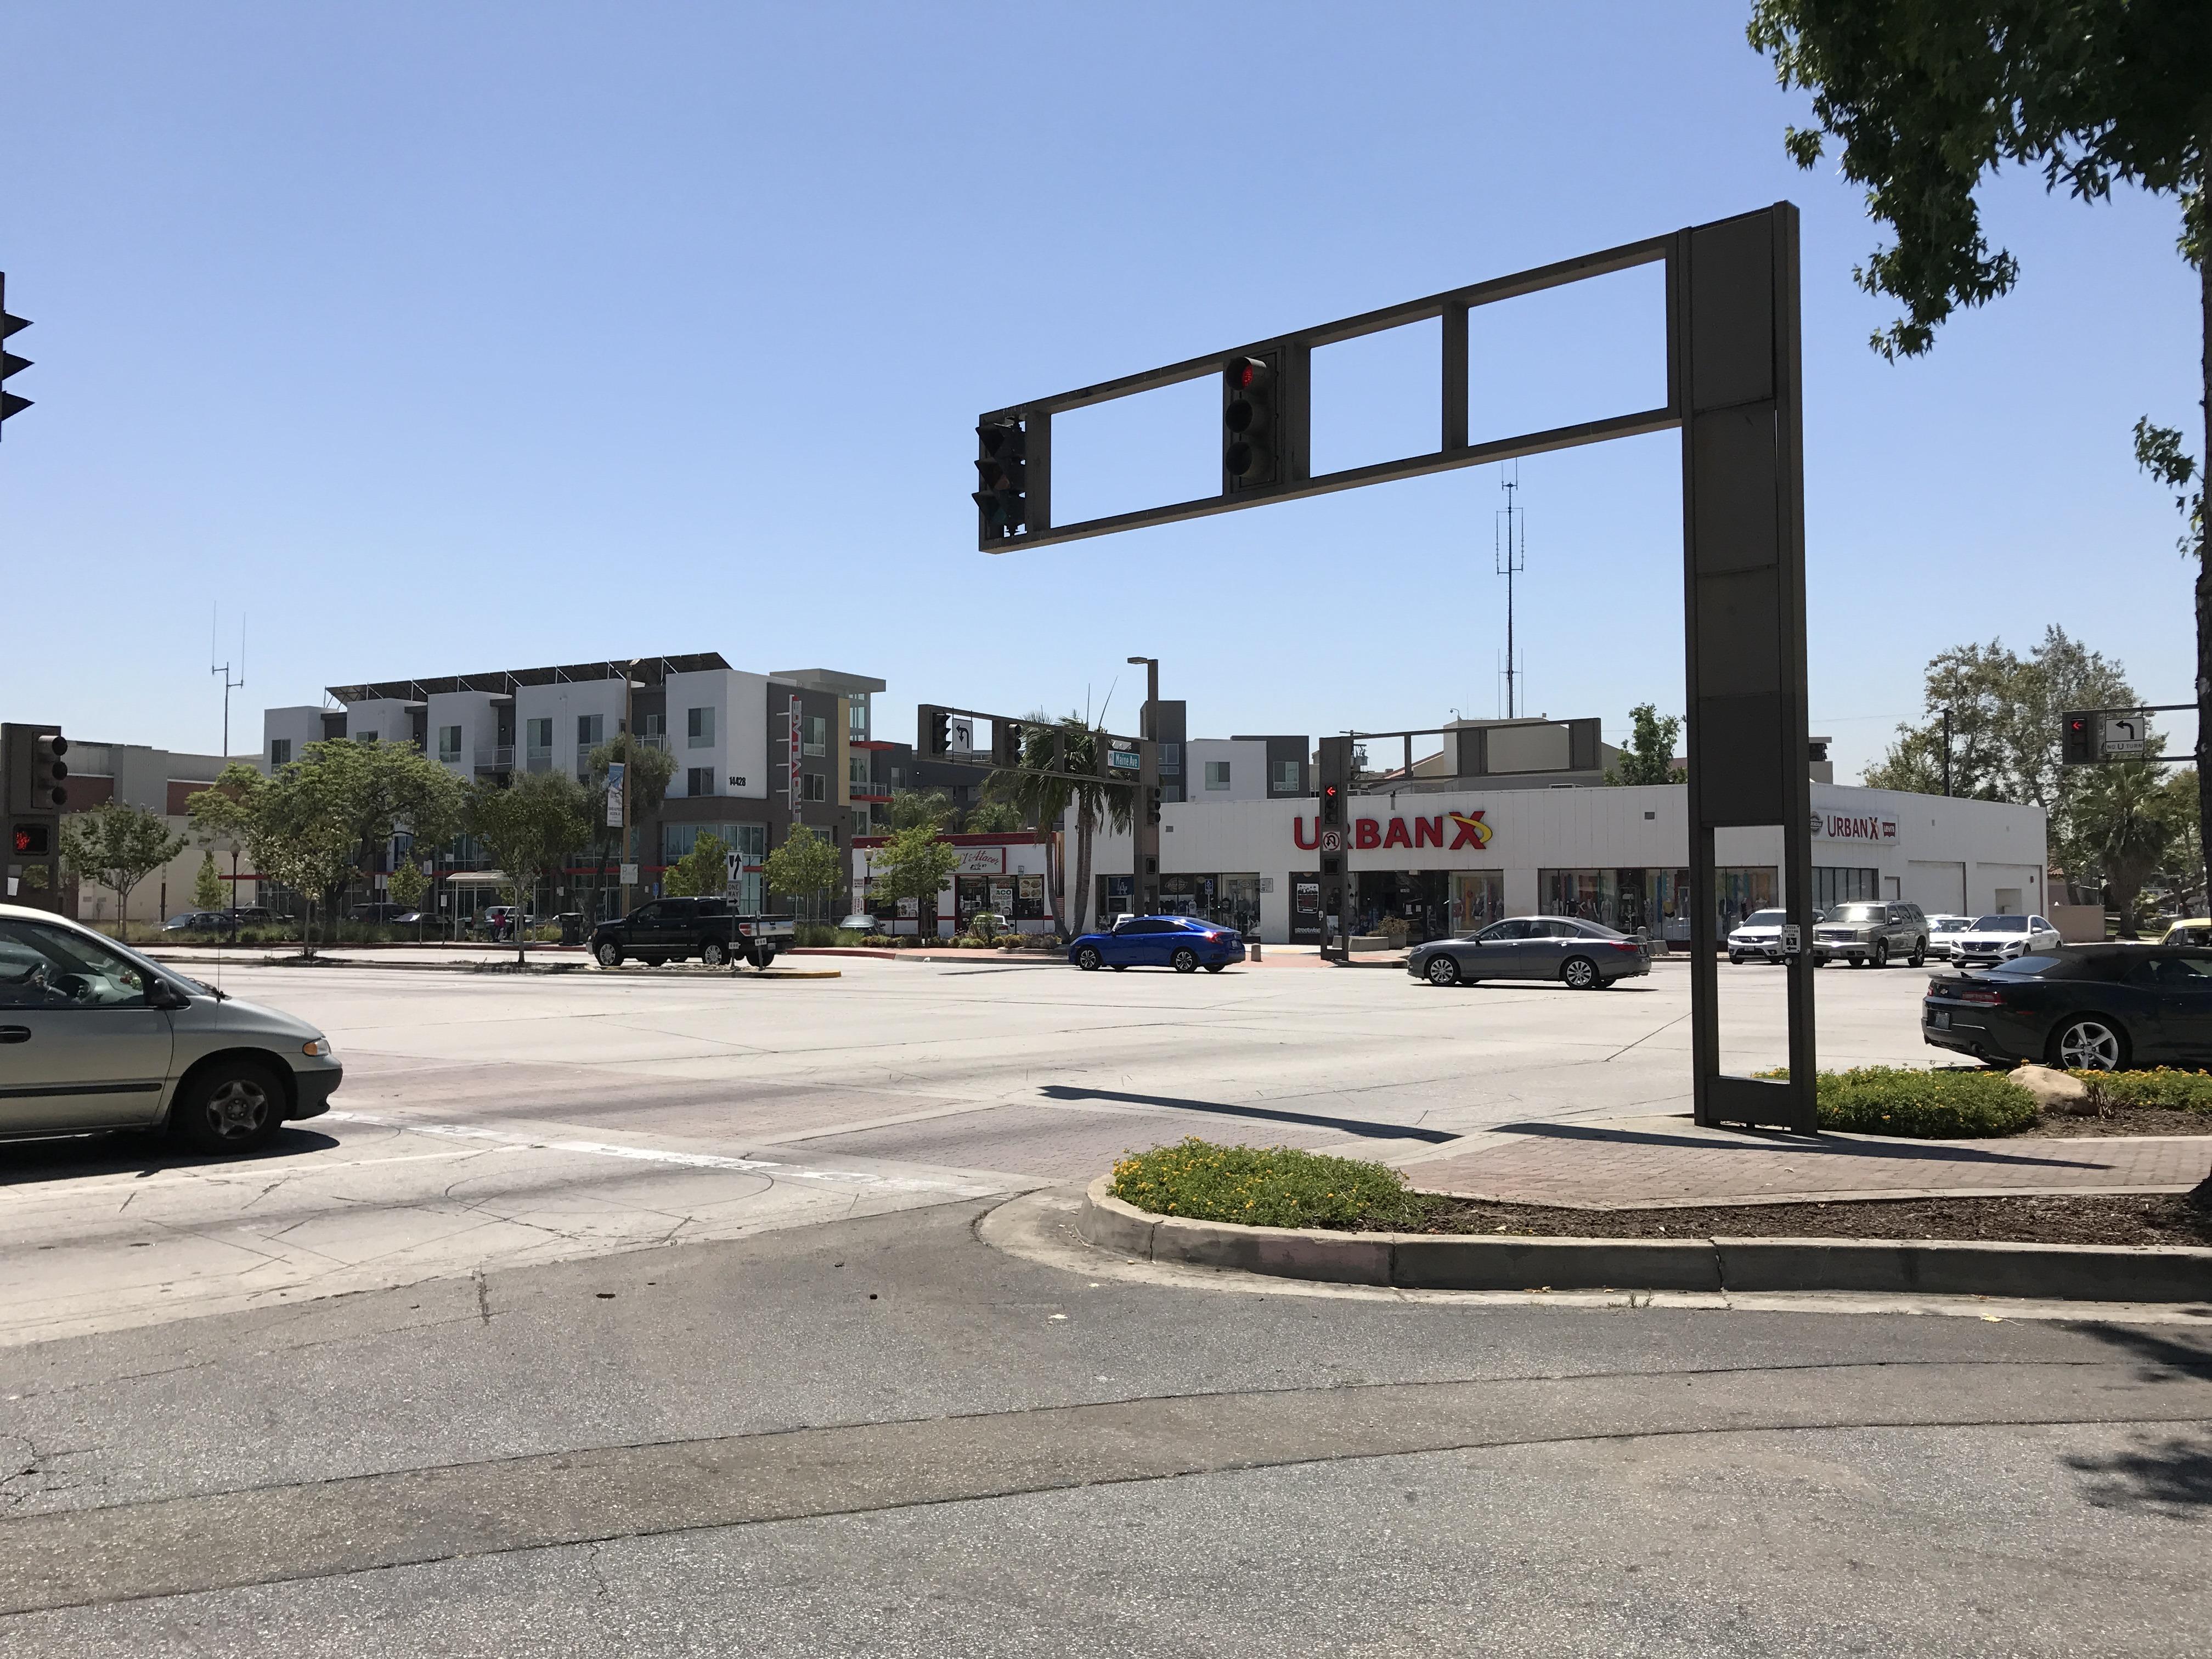 Commercial Locksmith in Baldwin Park LA